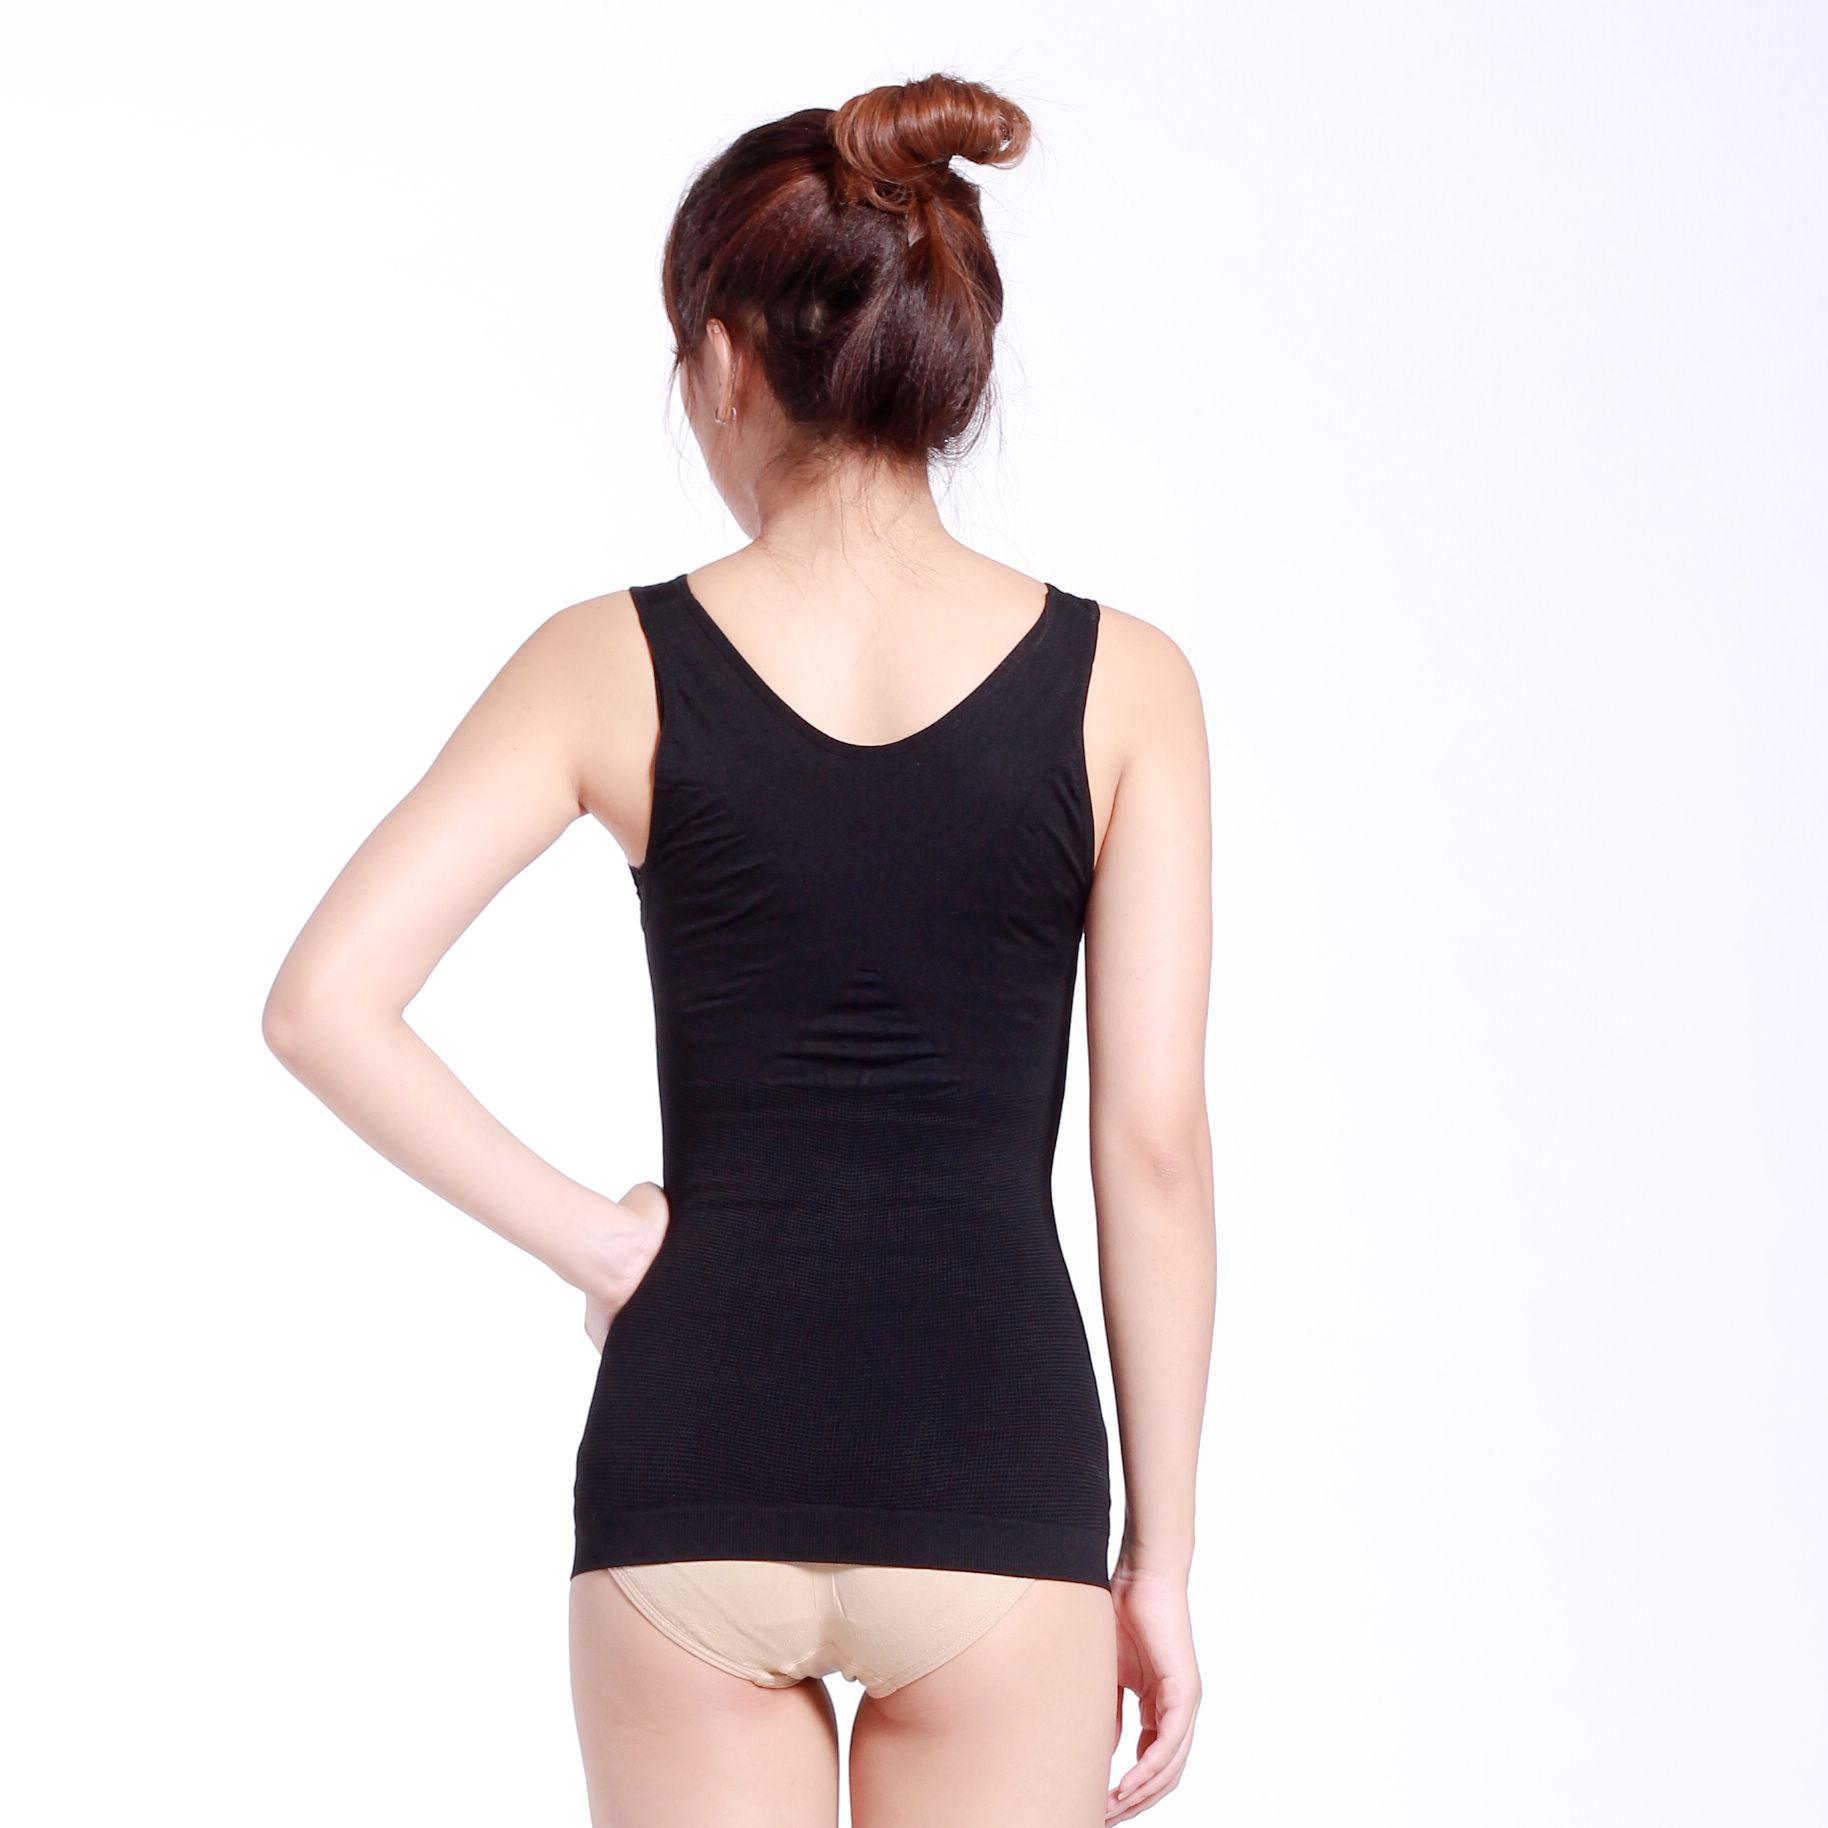 INSMANX美体塑身衣收腹时间女托胸瘦身收胃瘦背心每天做多长手臂图片